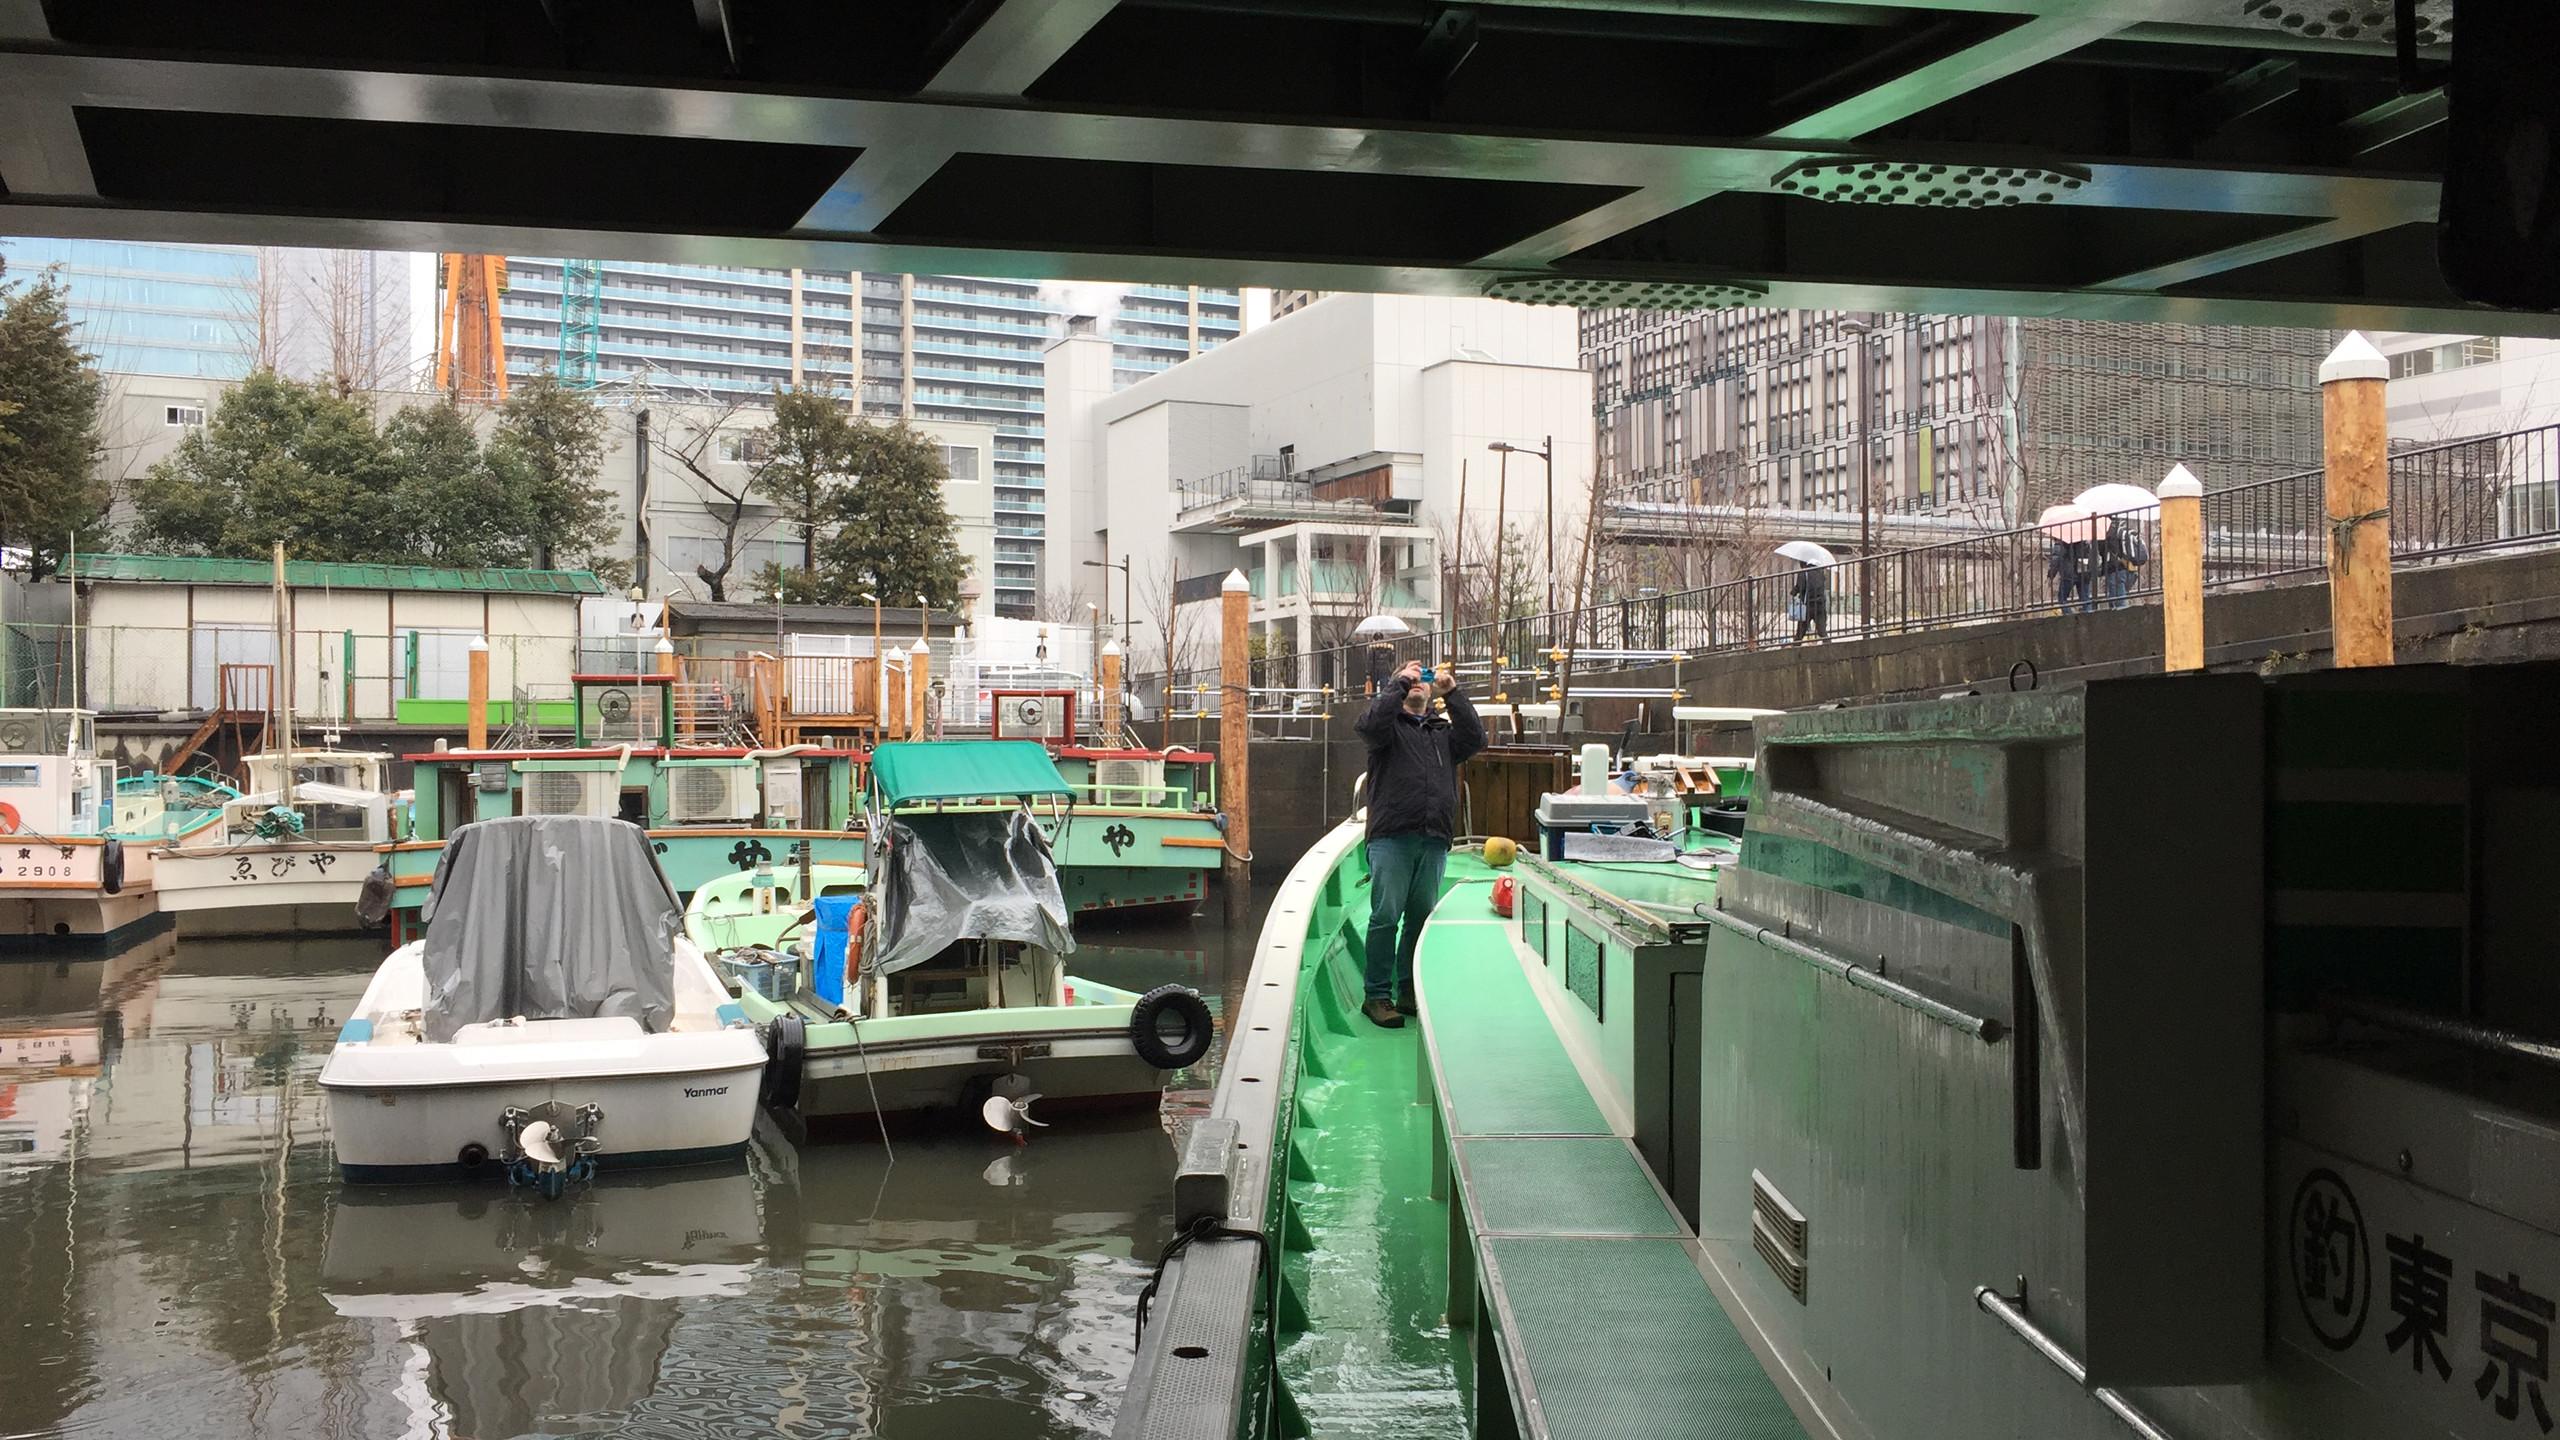 Charter vessel underway clearing a low bridge in downtown Tokyo